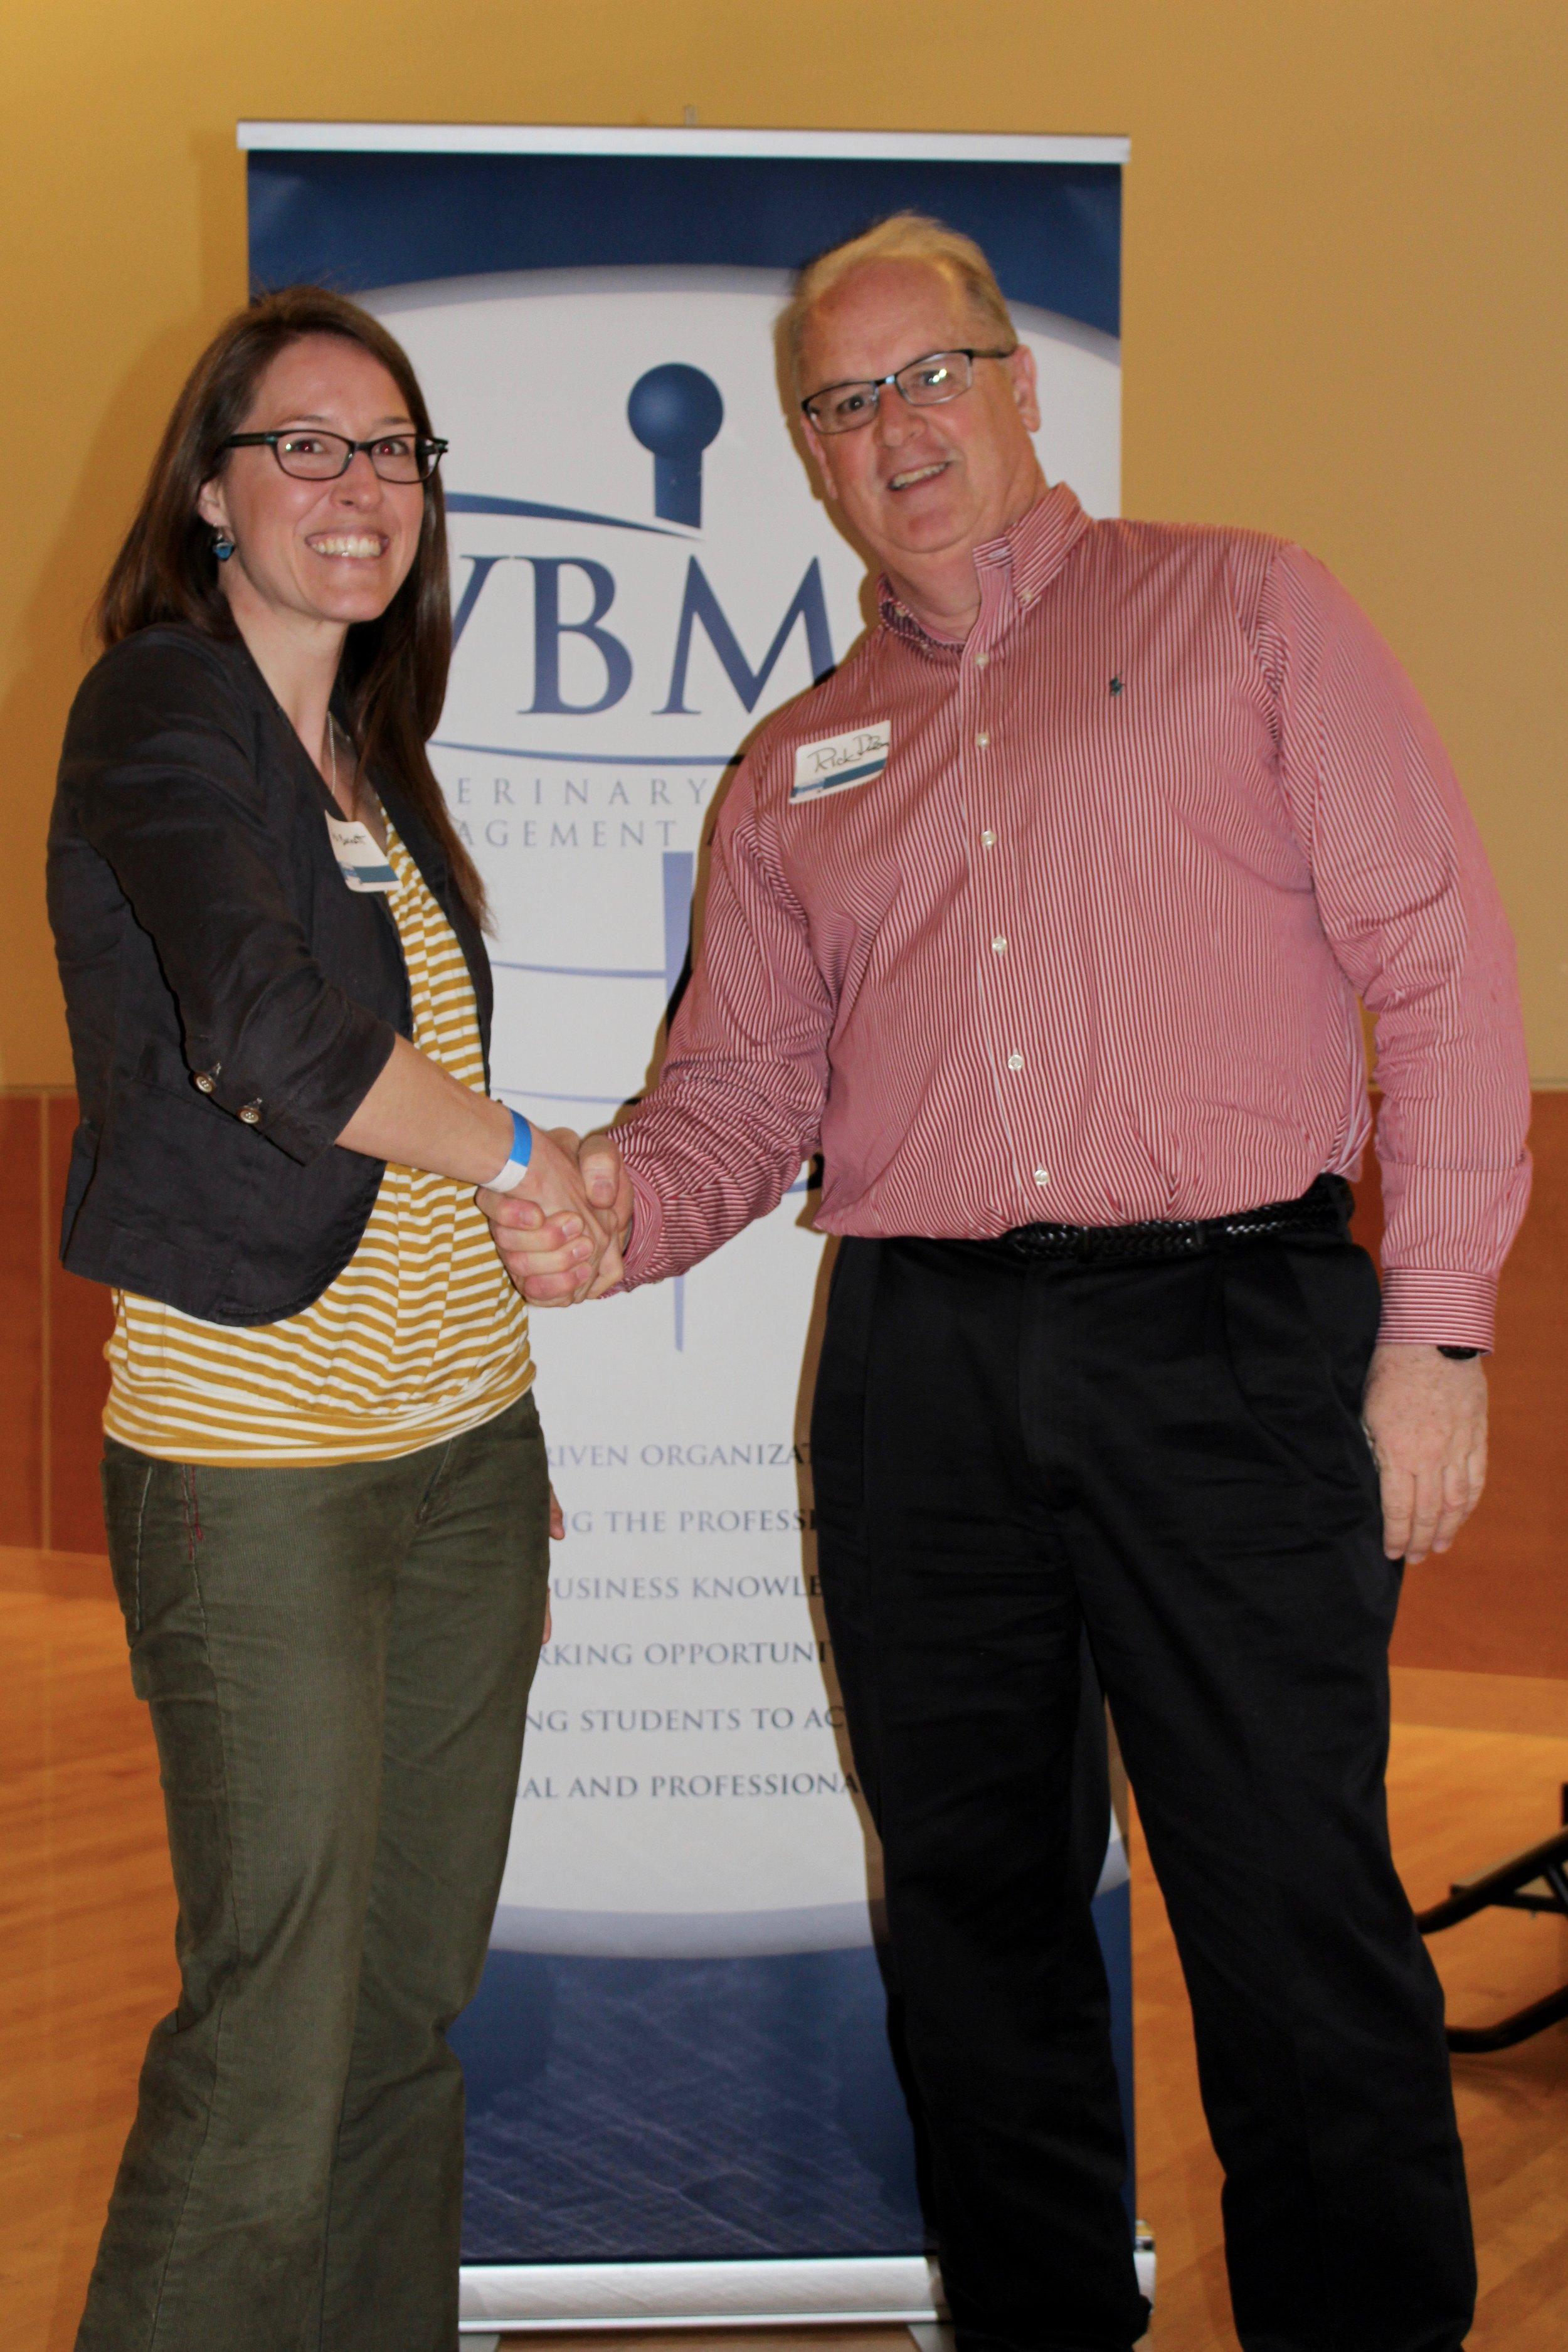 VBMA Partners in Practice - 77 of 129.jpg